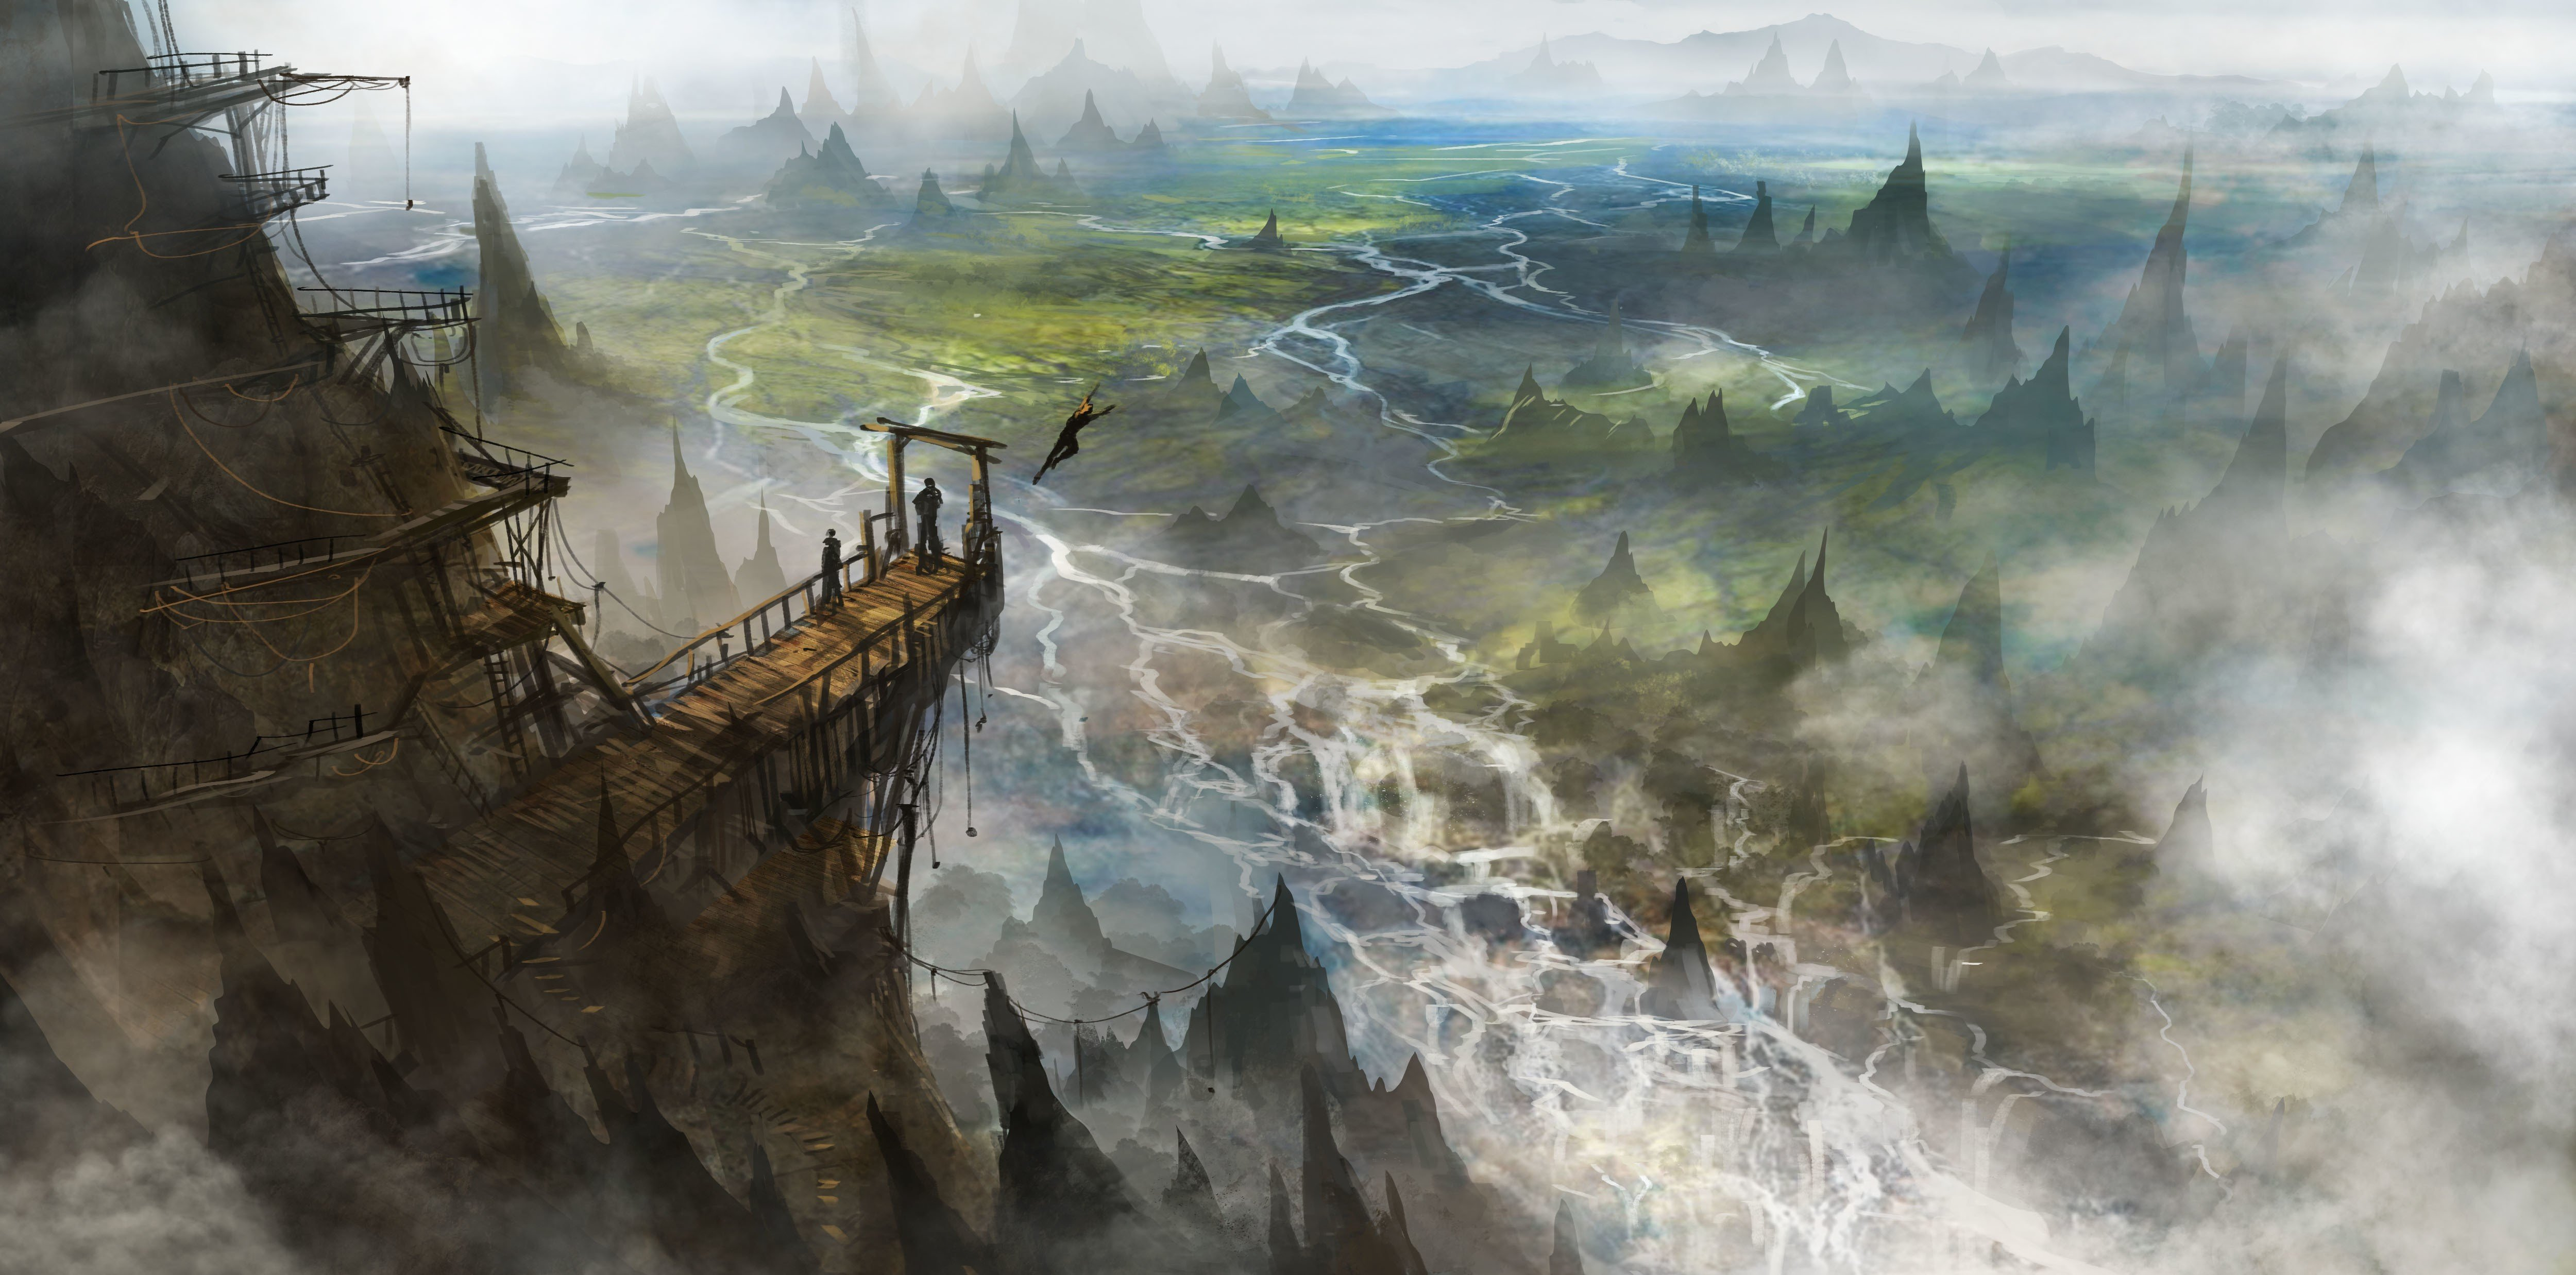 Fantasy Landscape Art Artwork Nature Scenery Wallpaper 5000x2475 666664 Wallpaperup